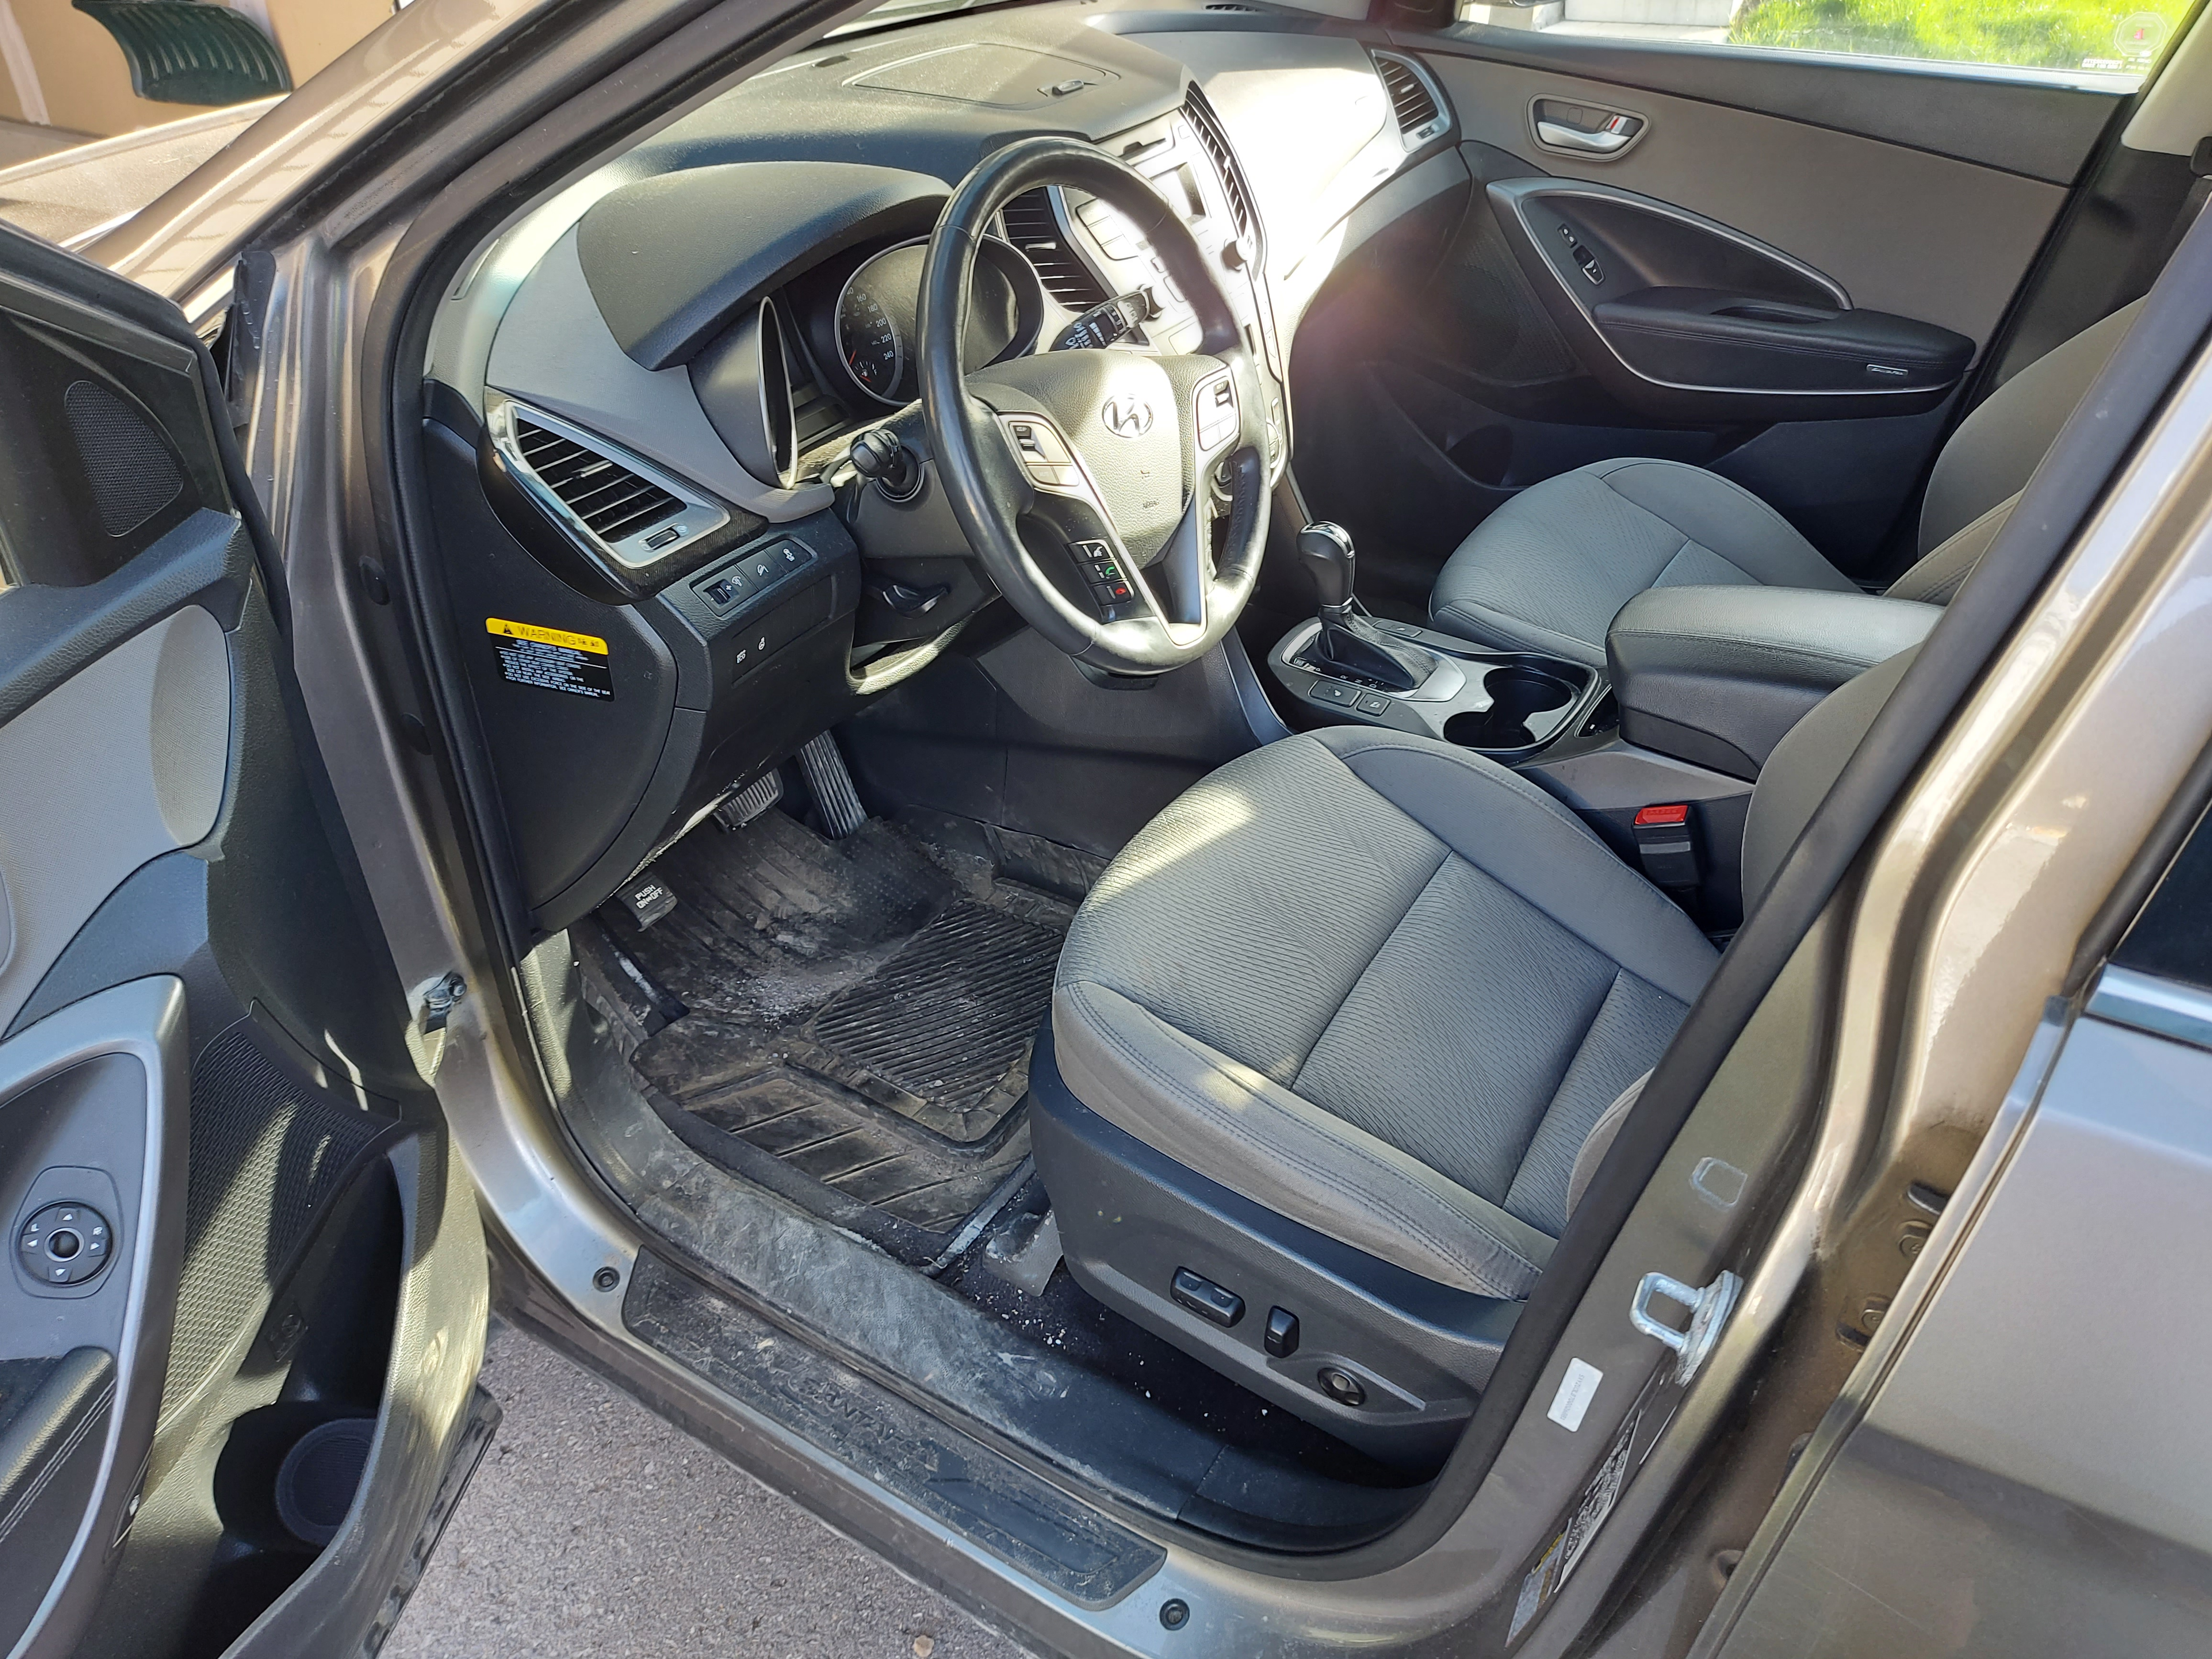 Kanata car detailing review